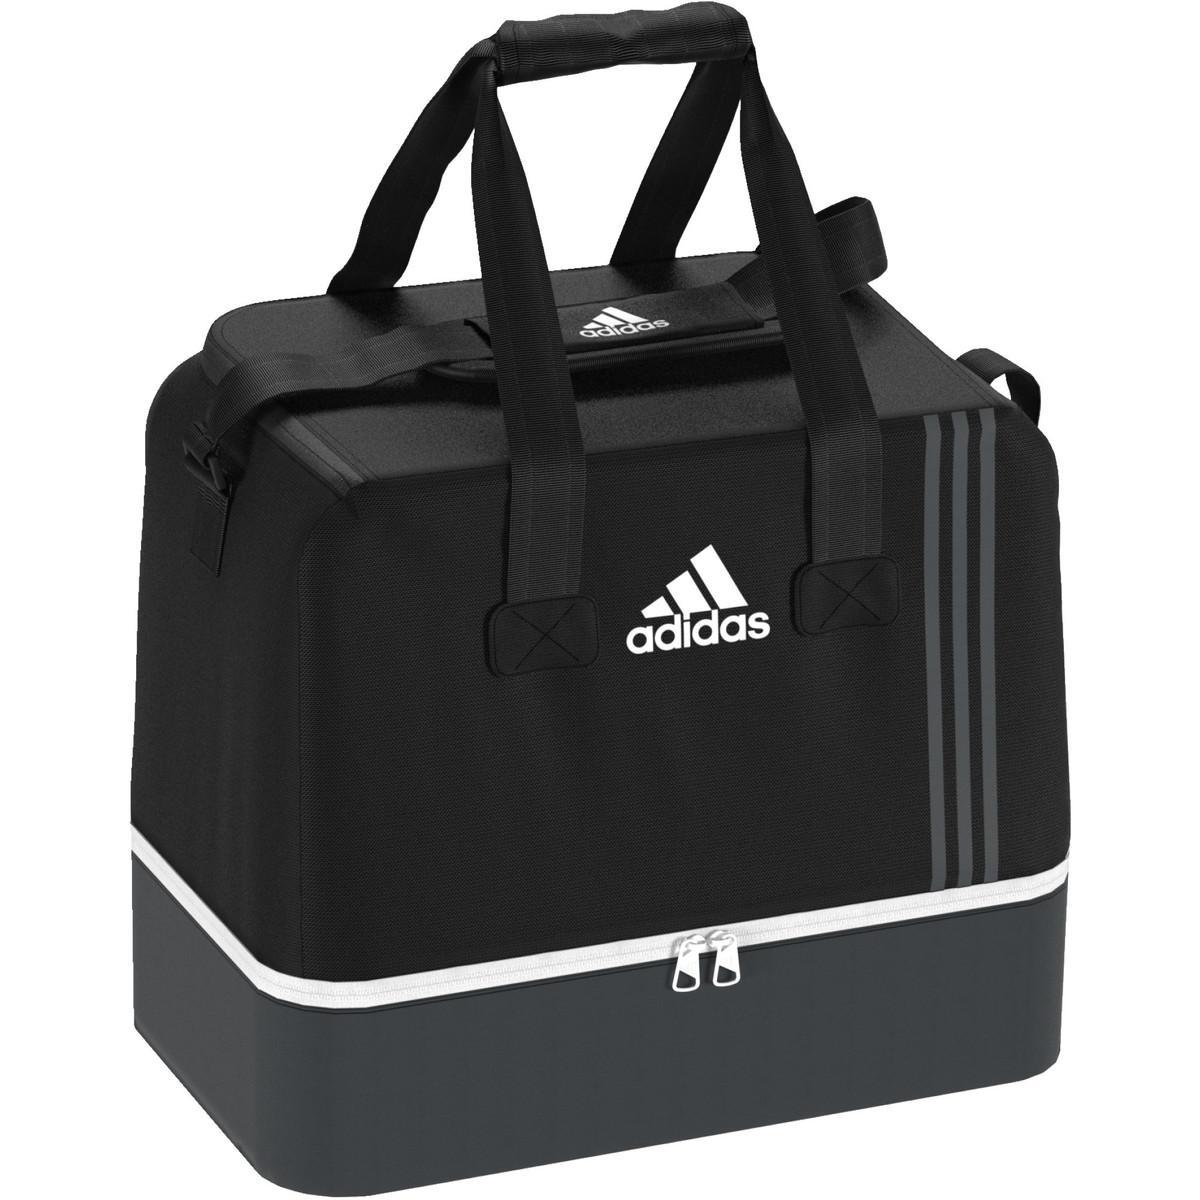 d0ad83b2e5 S Adidas Femmes Sport Pour Lyst De Teambag En Sac Tiro Bc Noir wSUxCqAa